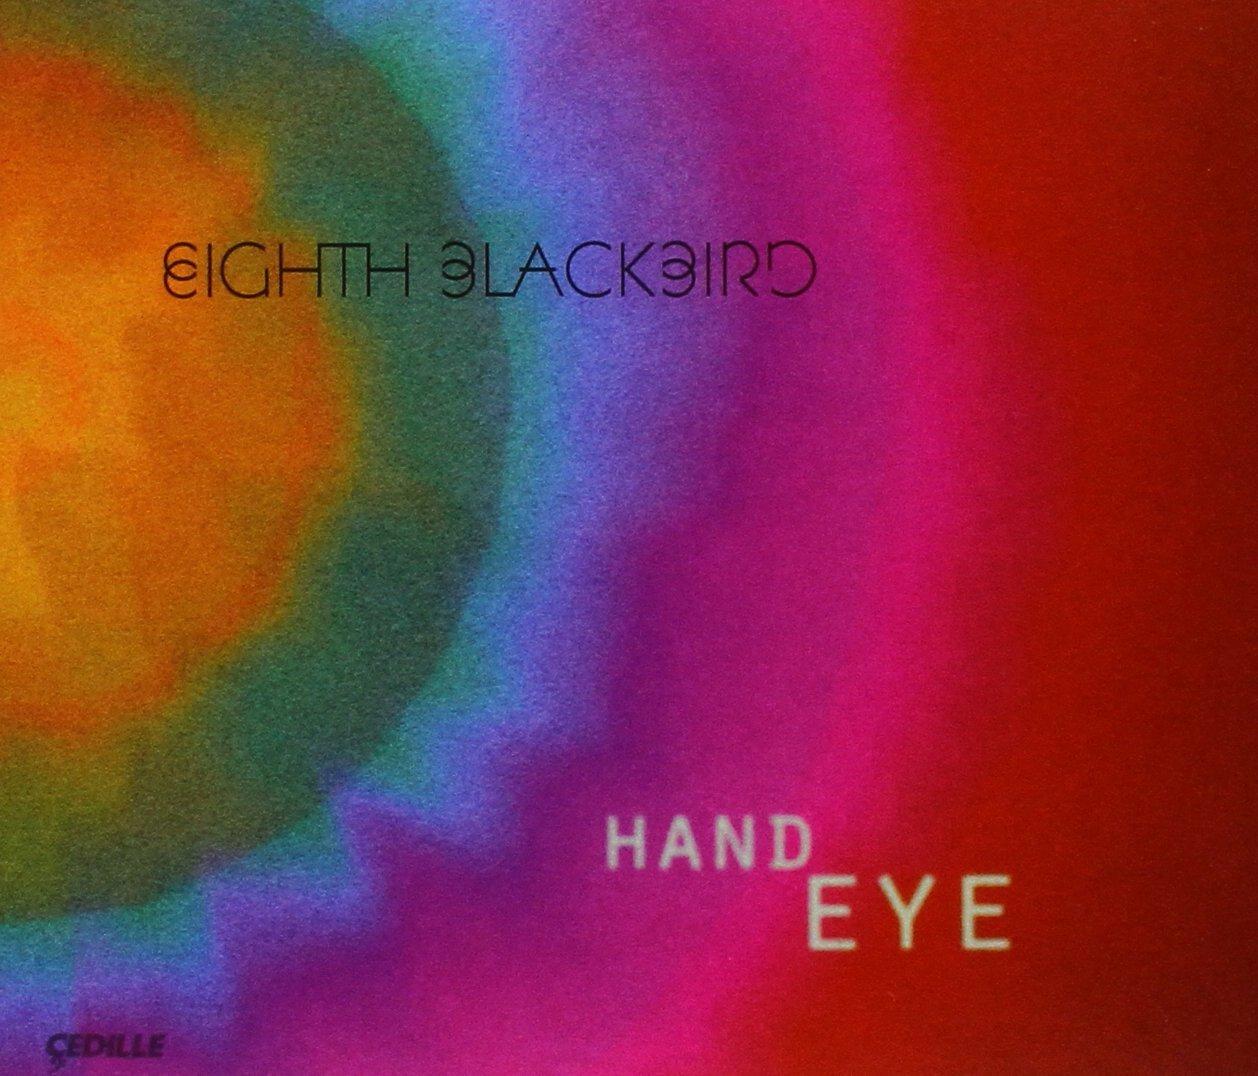 handeye